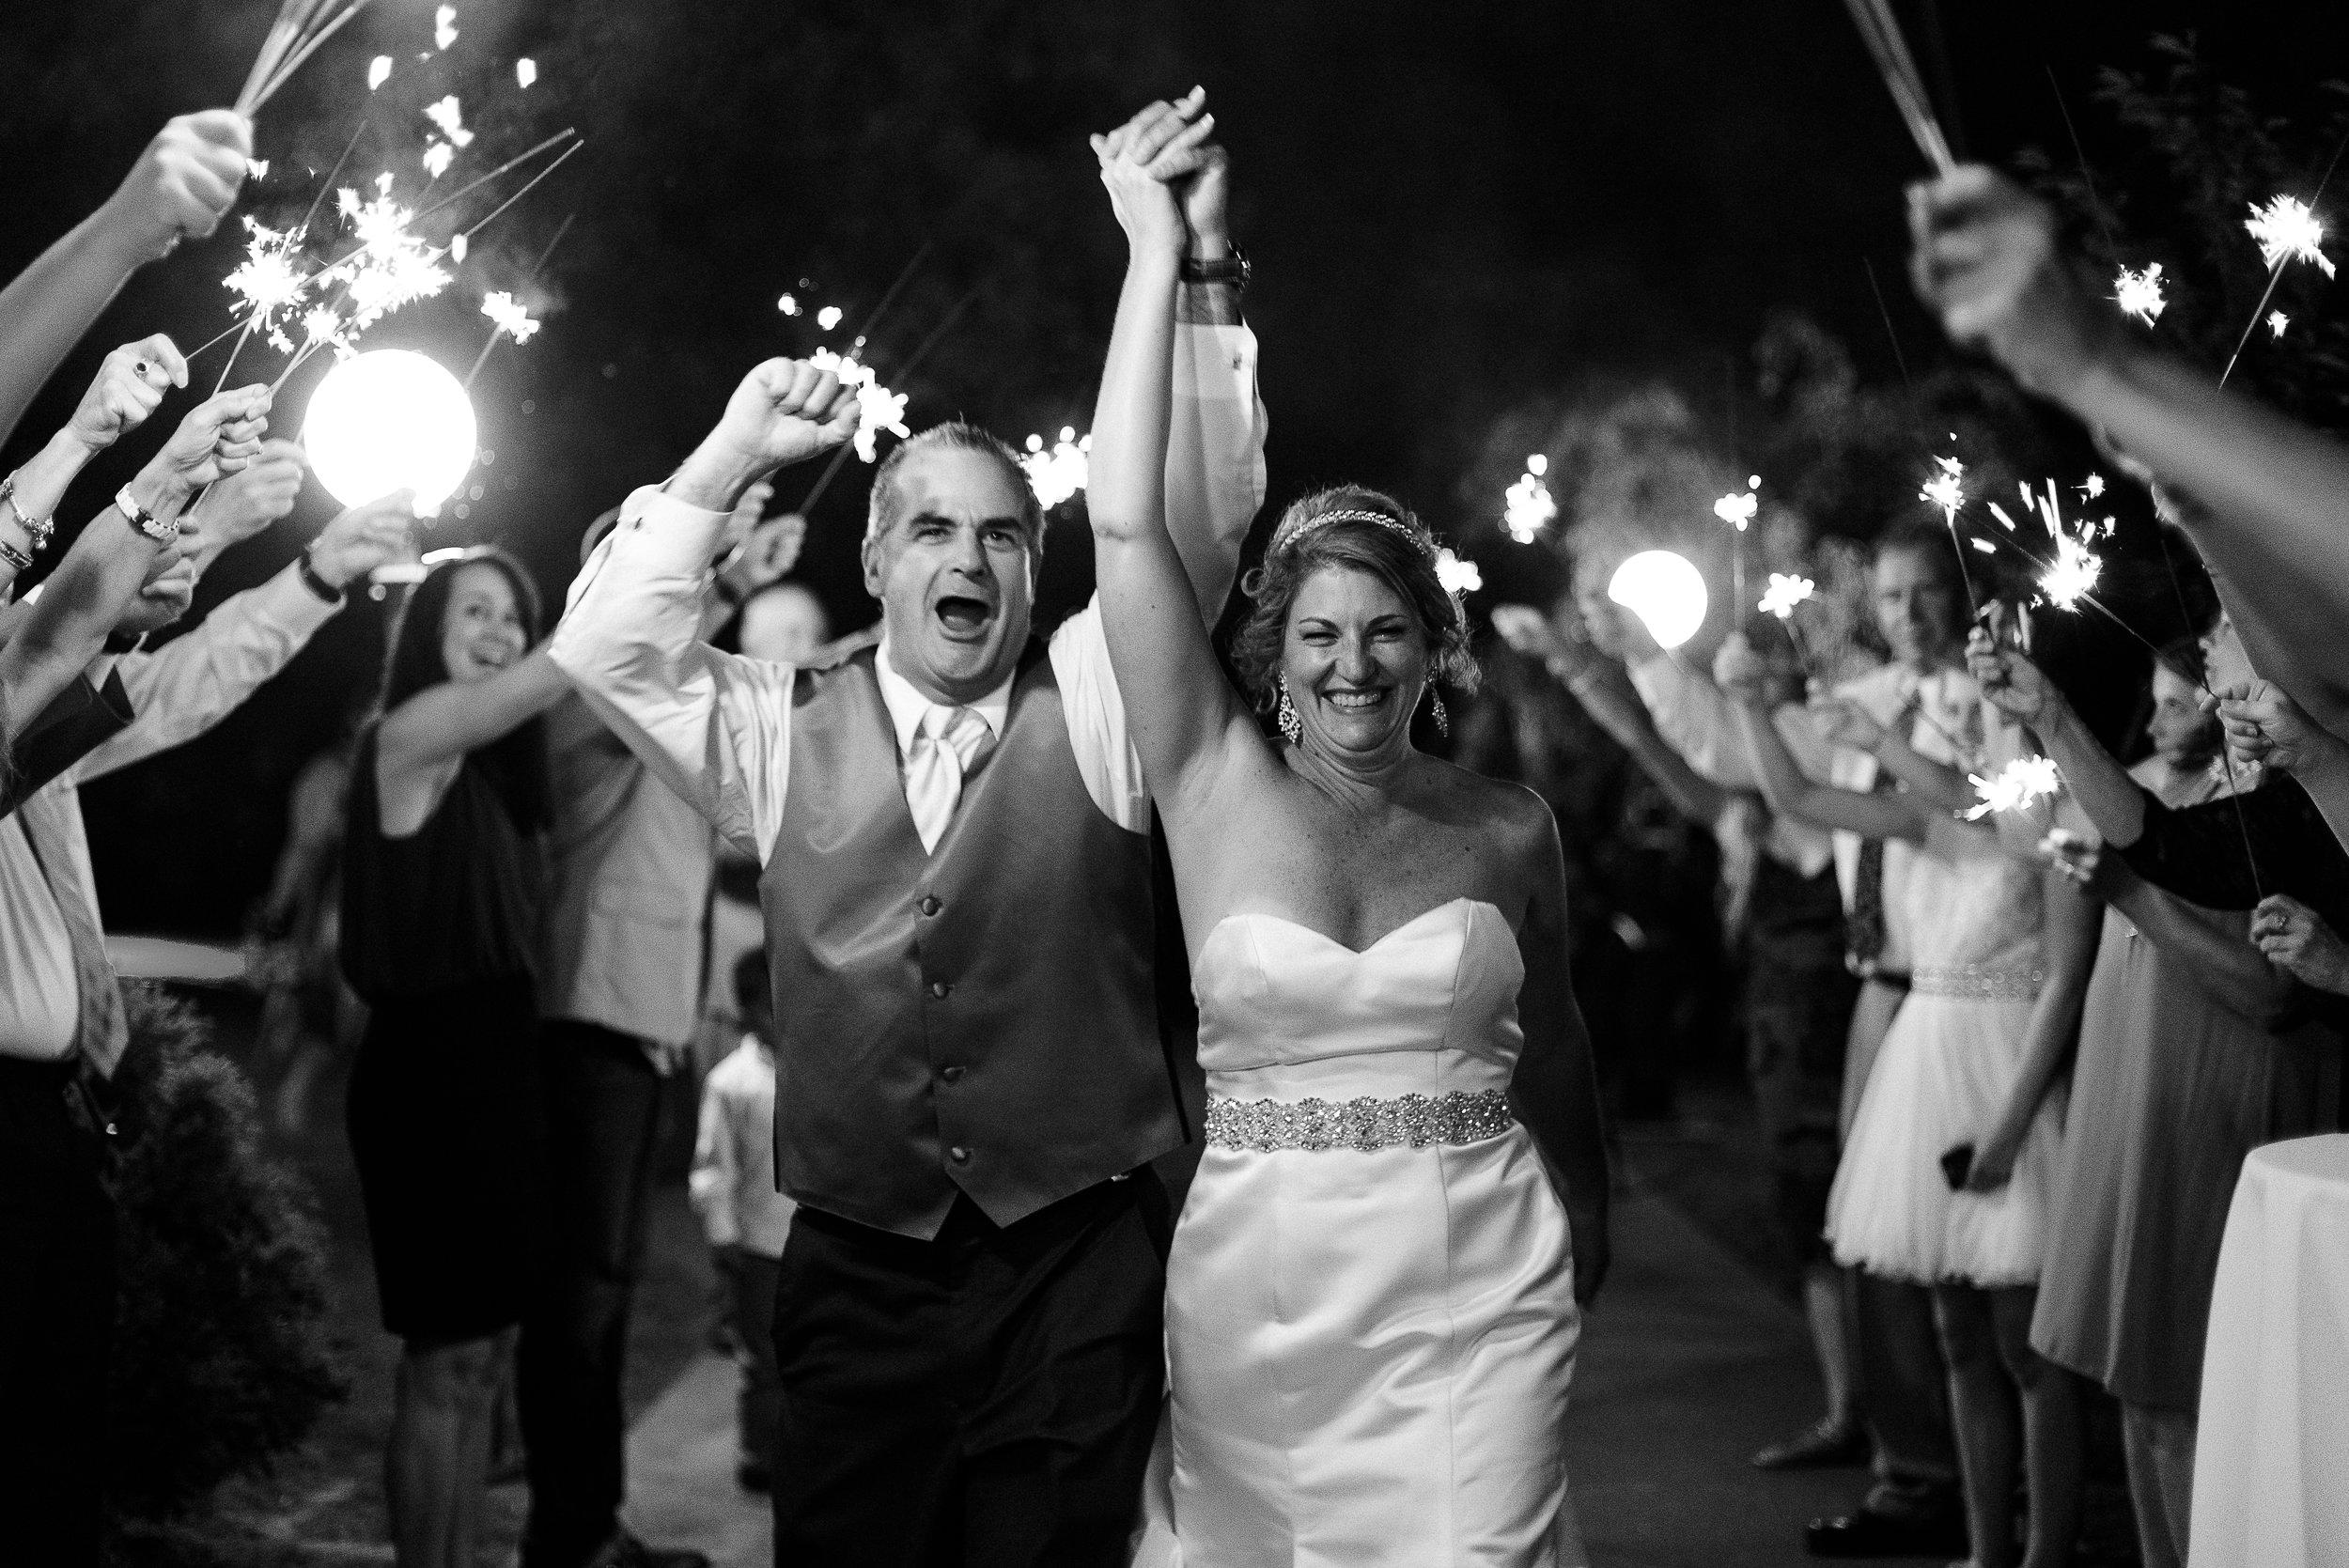 joyful-happy-wedding-photos